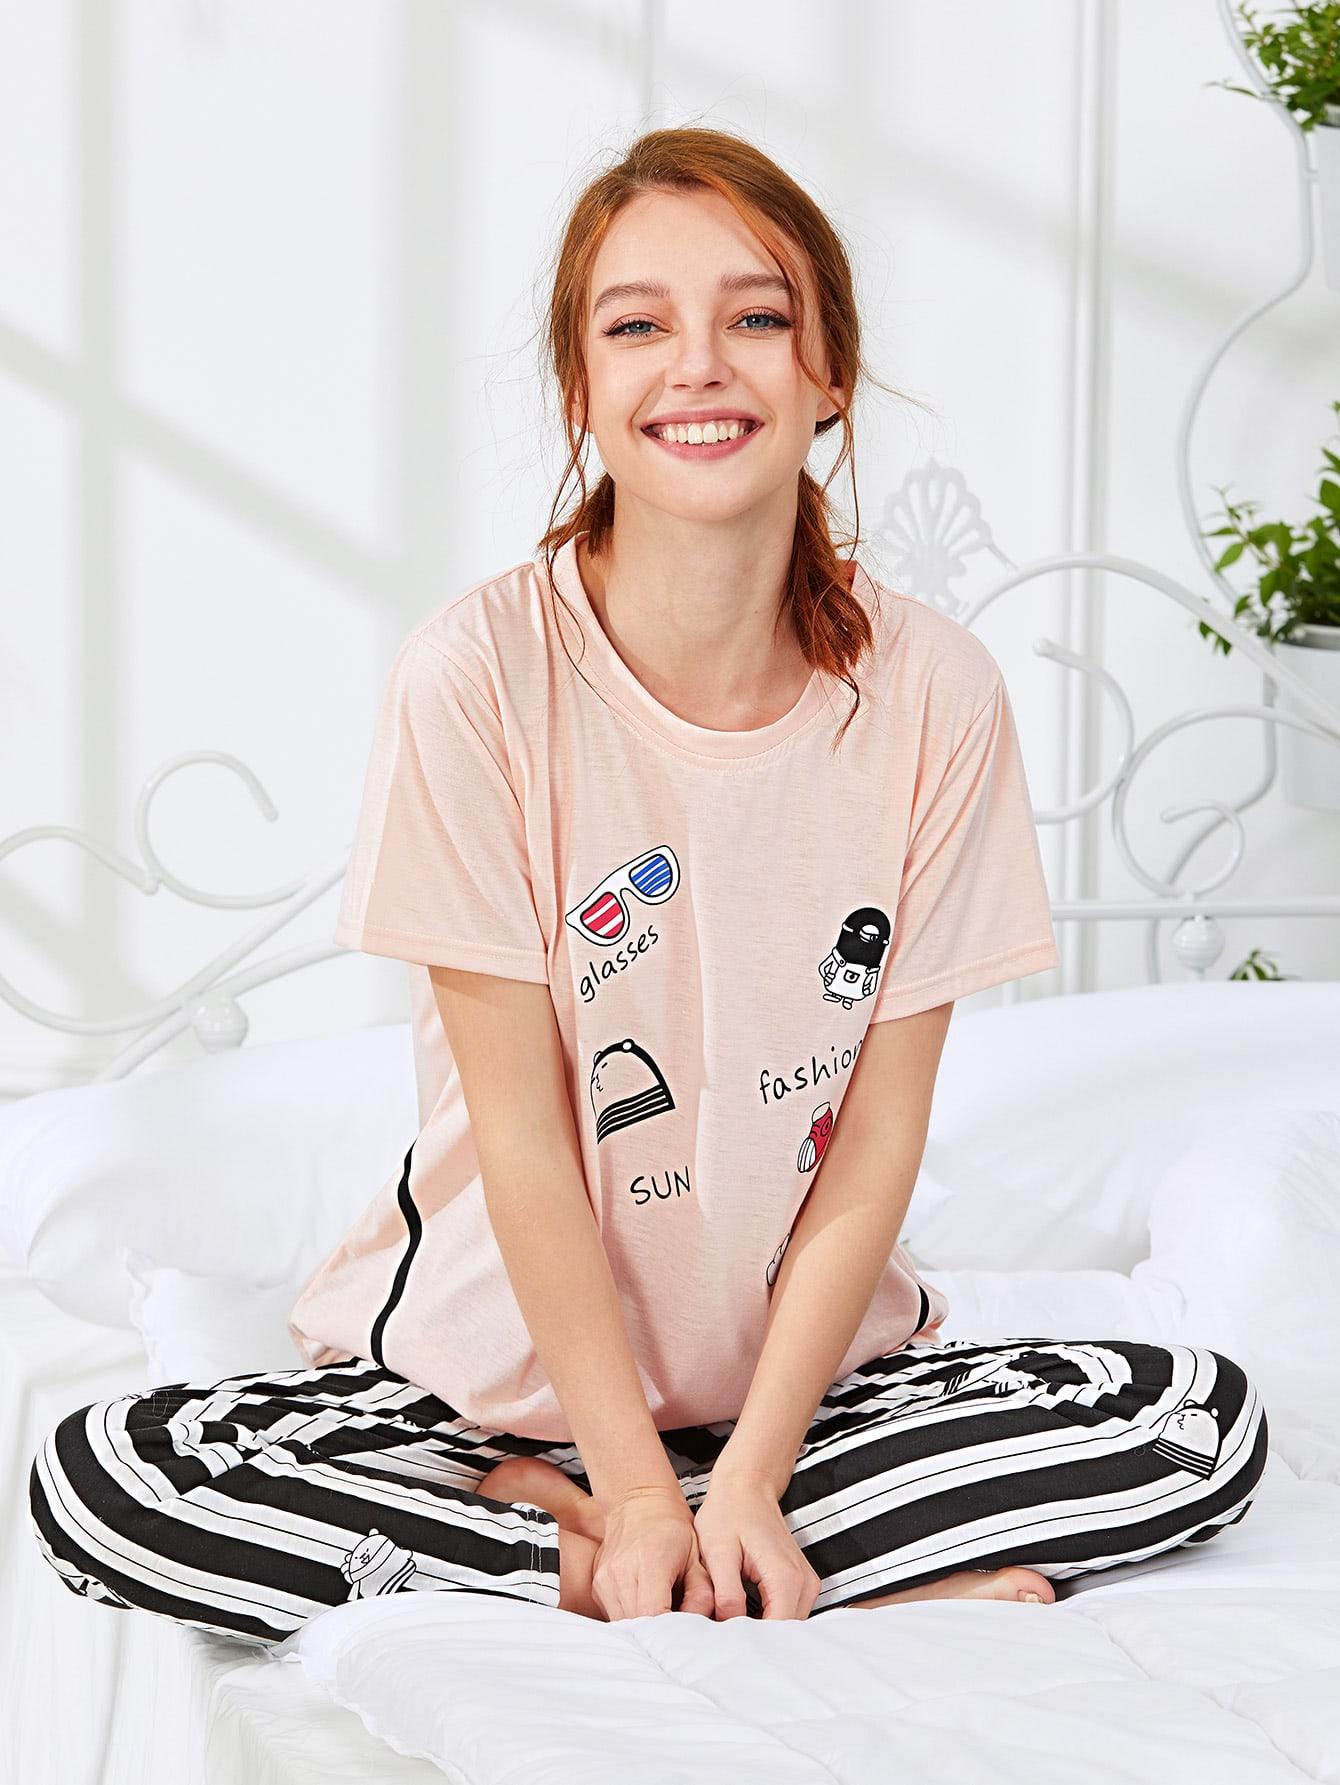 Cartoon Print Tee & Striped Pants PJ Set exmork 100 вт 12 в poly si